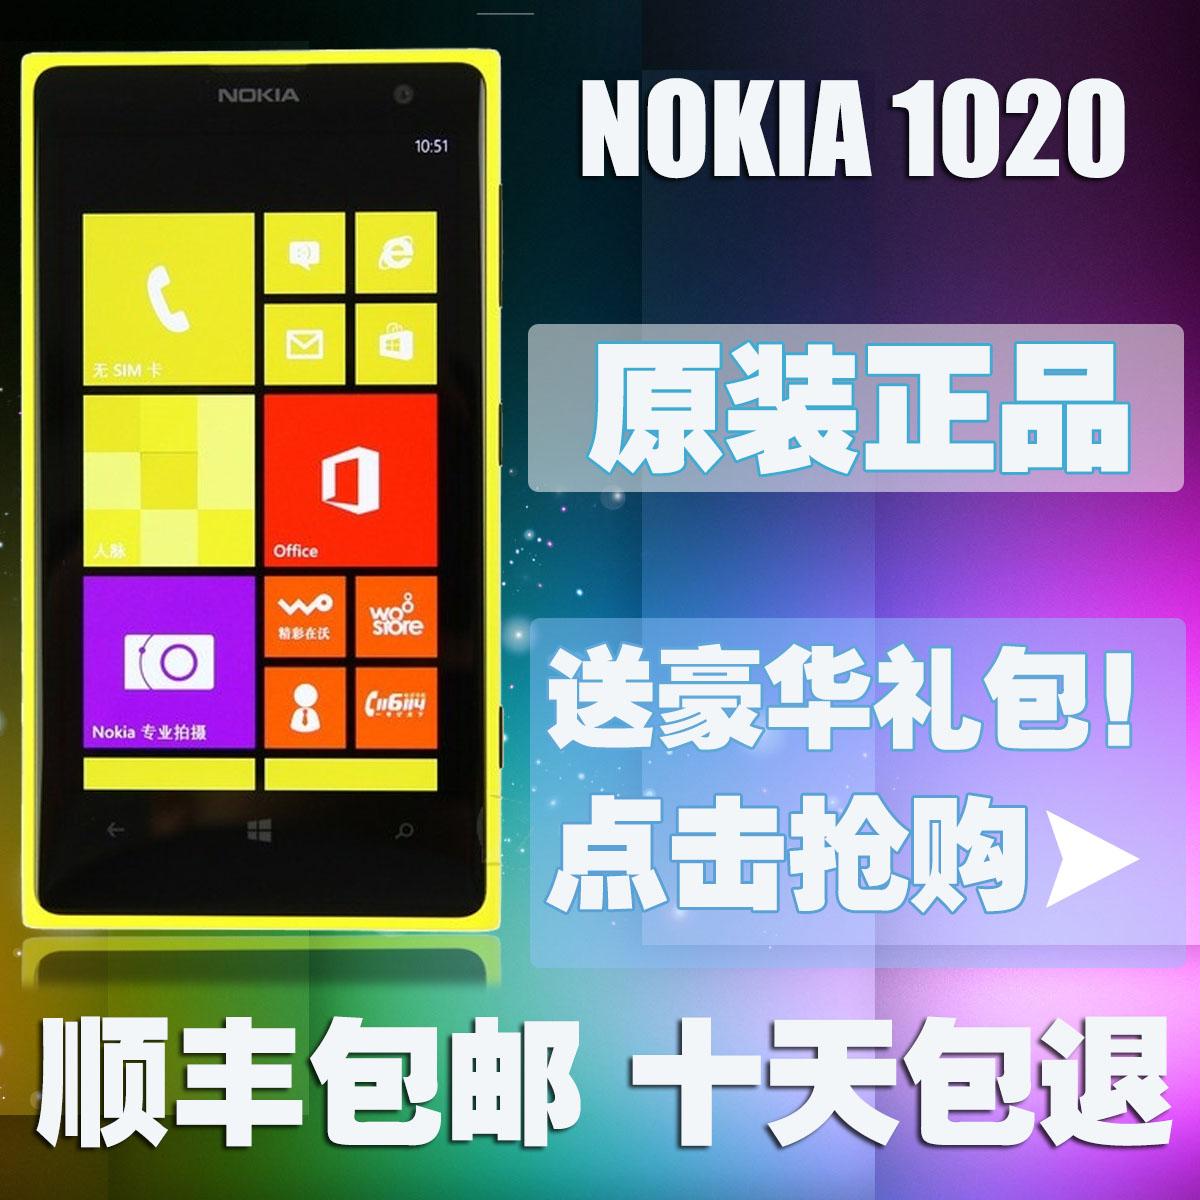 Мобильный телефон Nokia 1020 Lumia WP8 4100W nokia 6700 classic illuvial